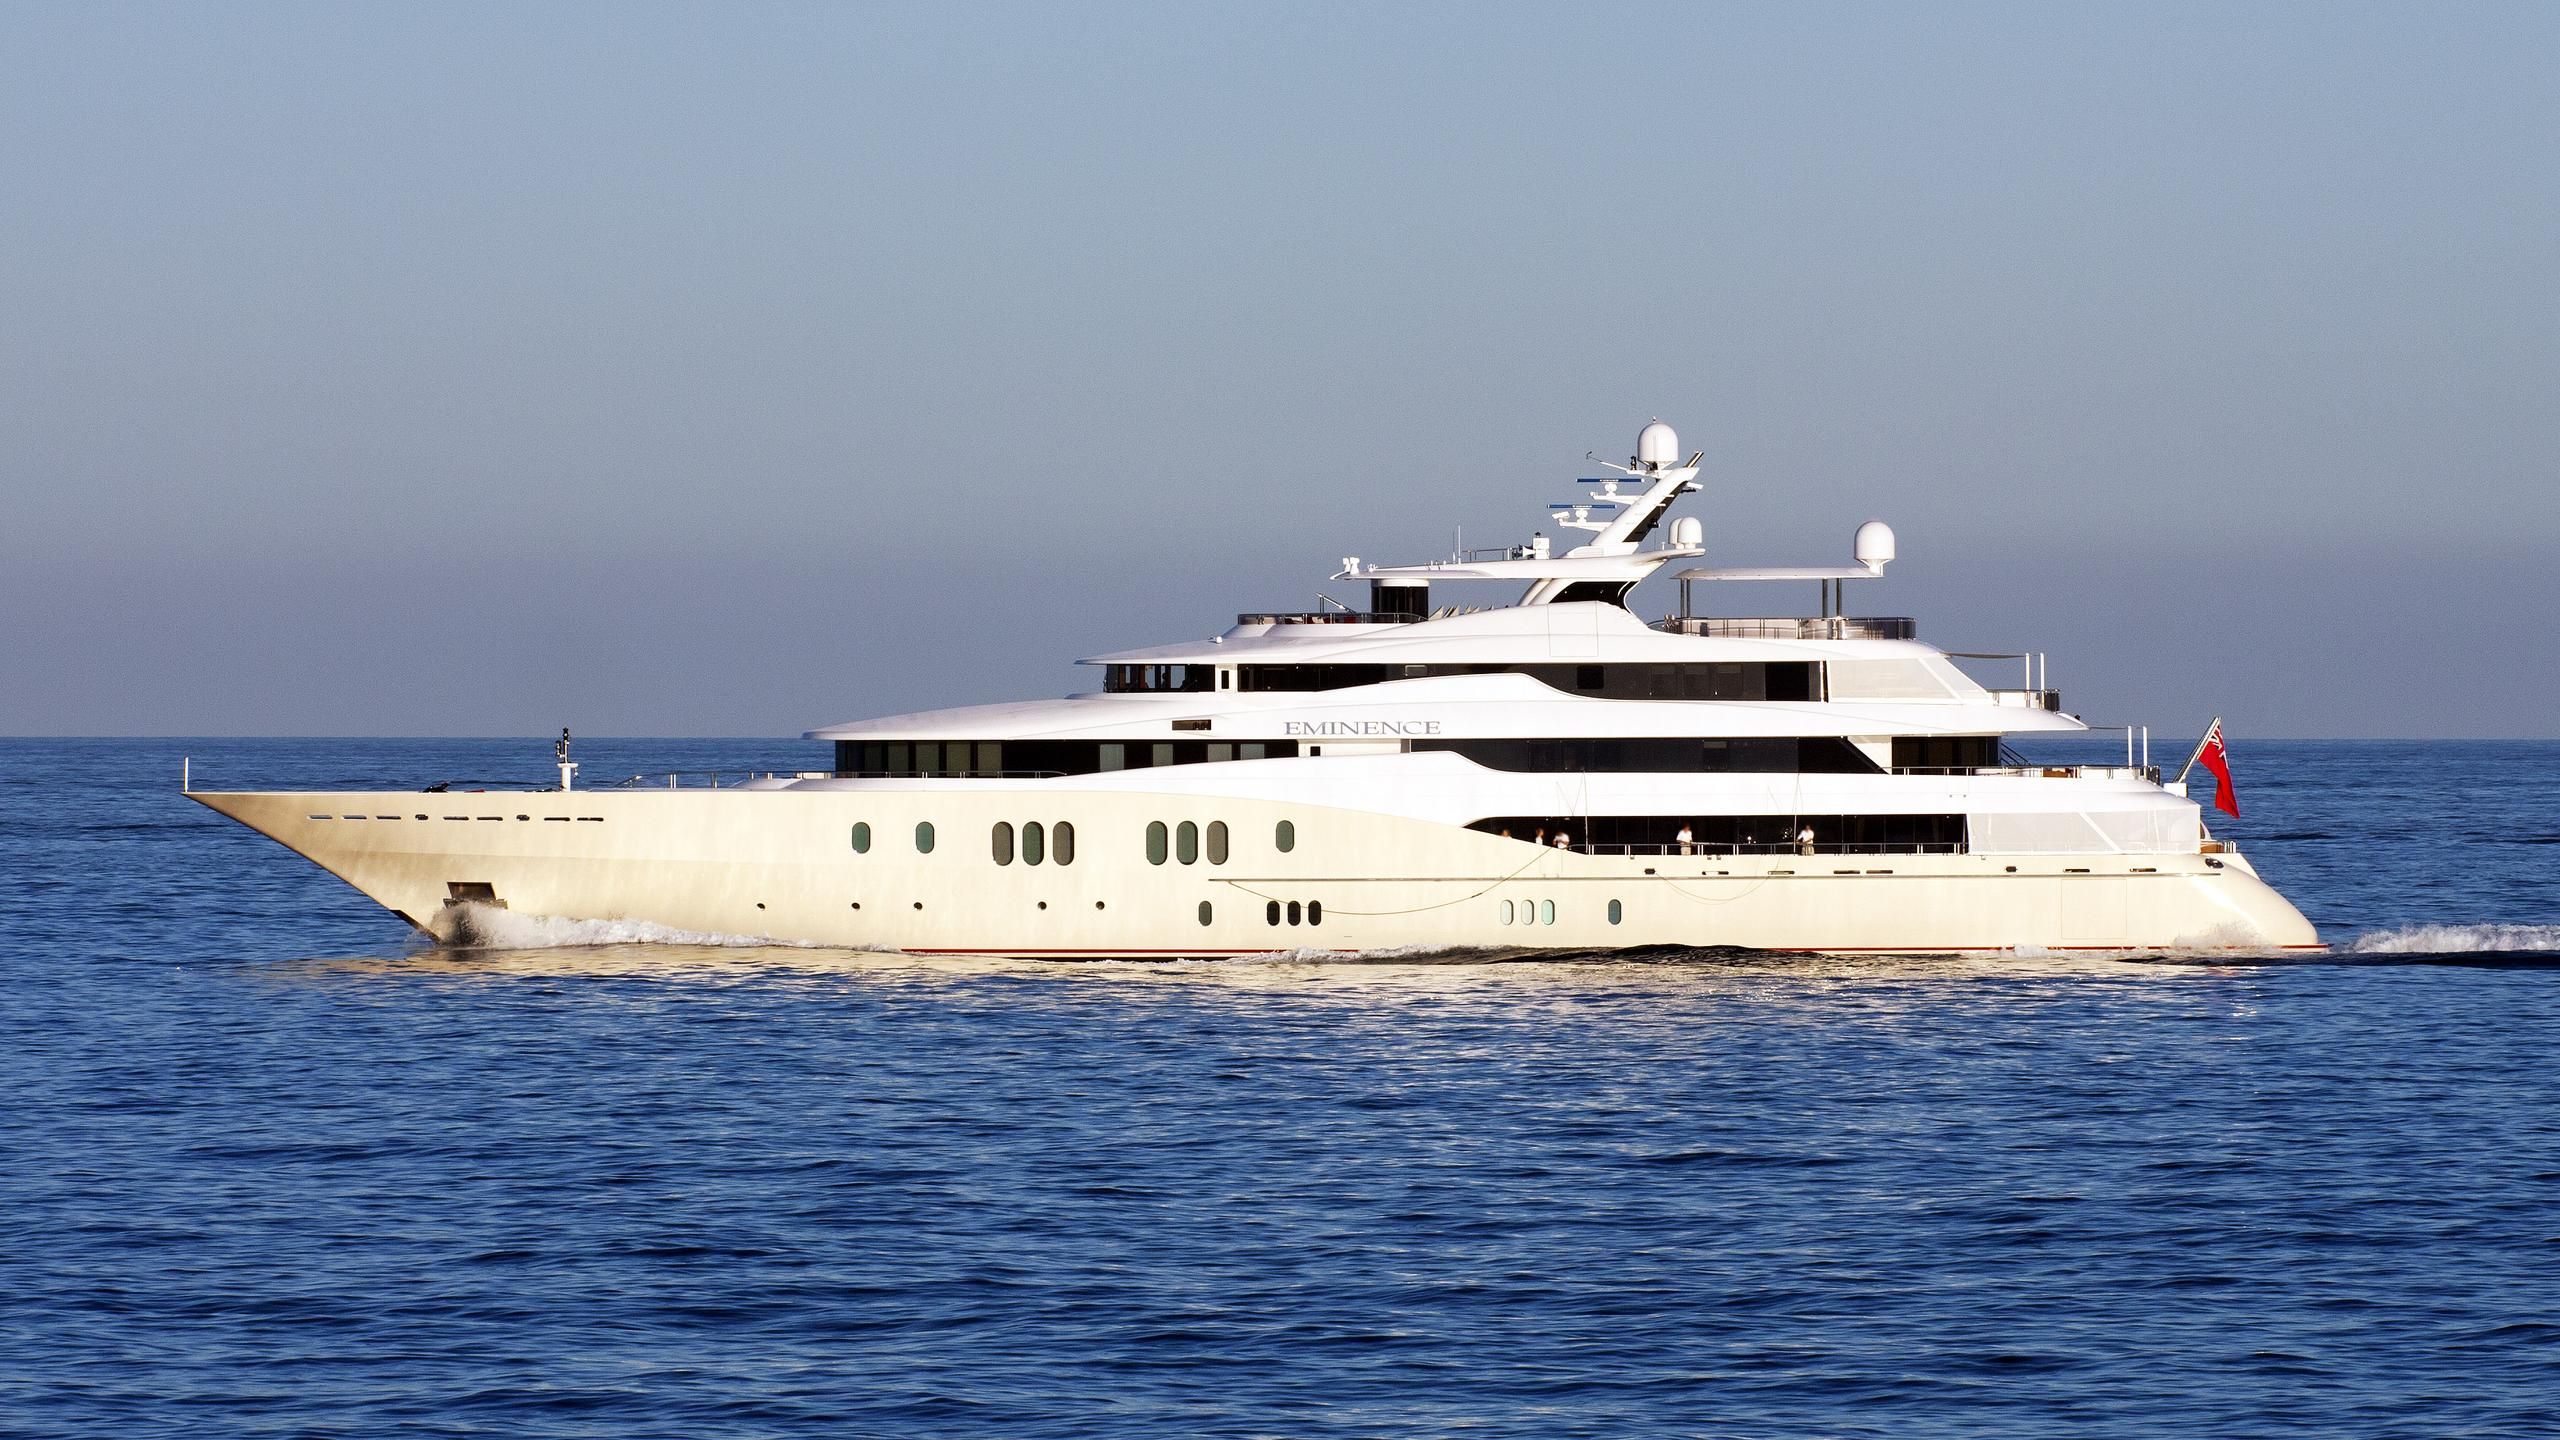 eminence-motor-yacht-abeking-rasmussen-2008-78m-cruising-profile.jpg eminence-motor-yacht-abeking-rasmussen-2008-78m-cruising-profile.jpg